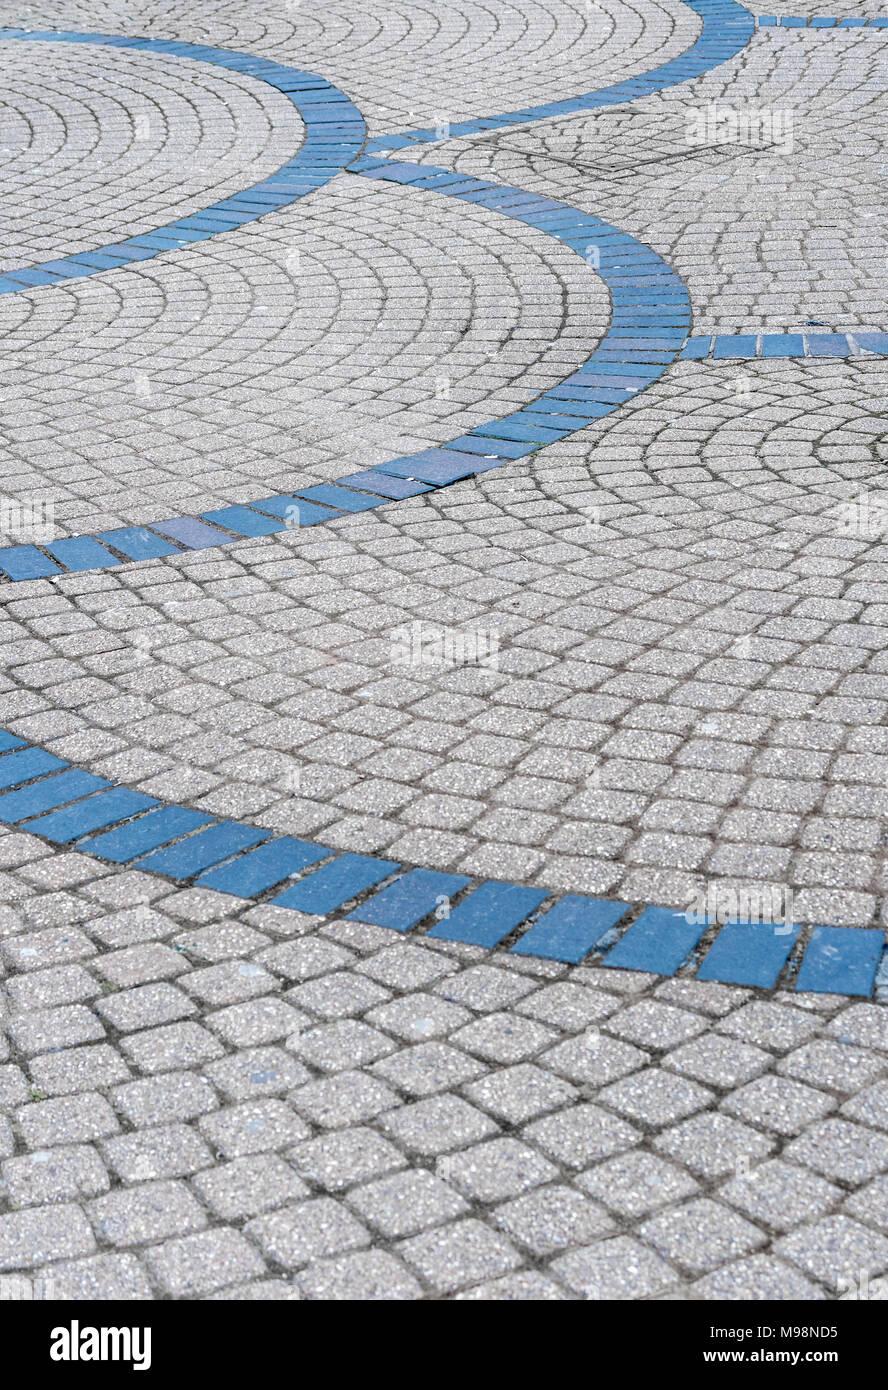 Curved brickwork patterns in Plymouth, Devon. - Stock Image